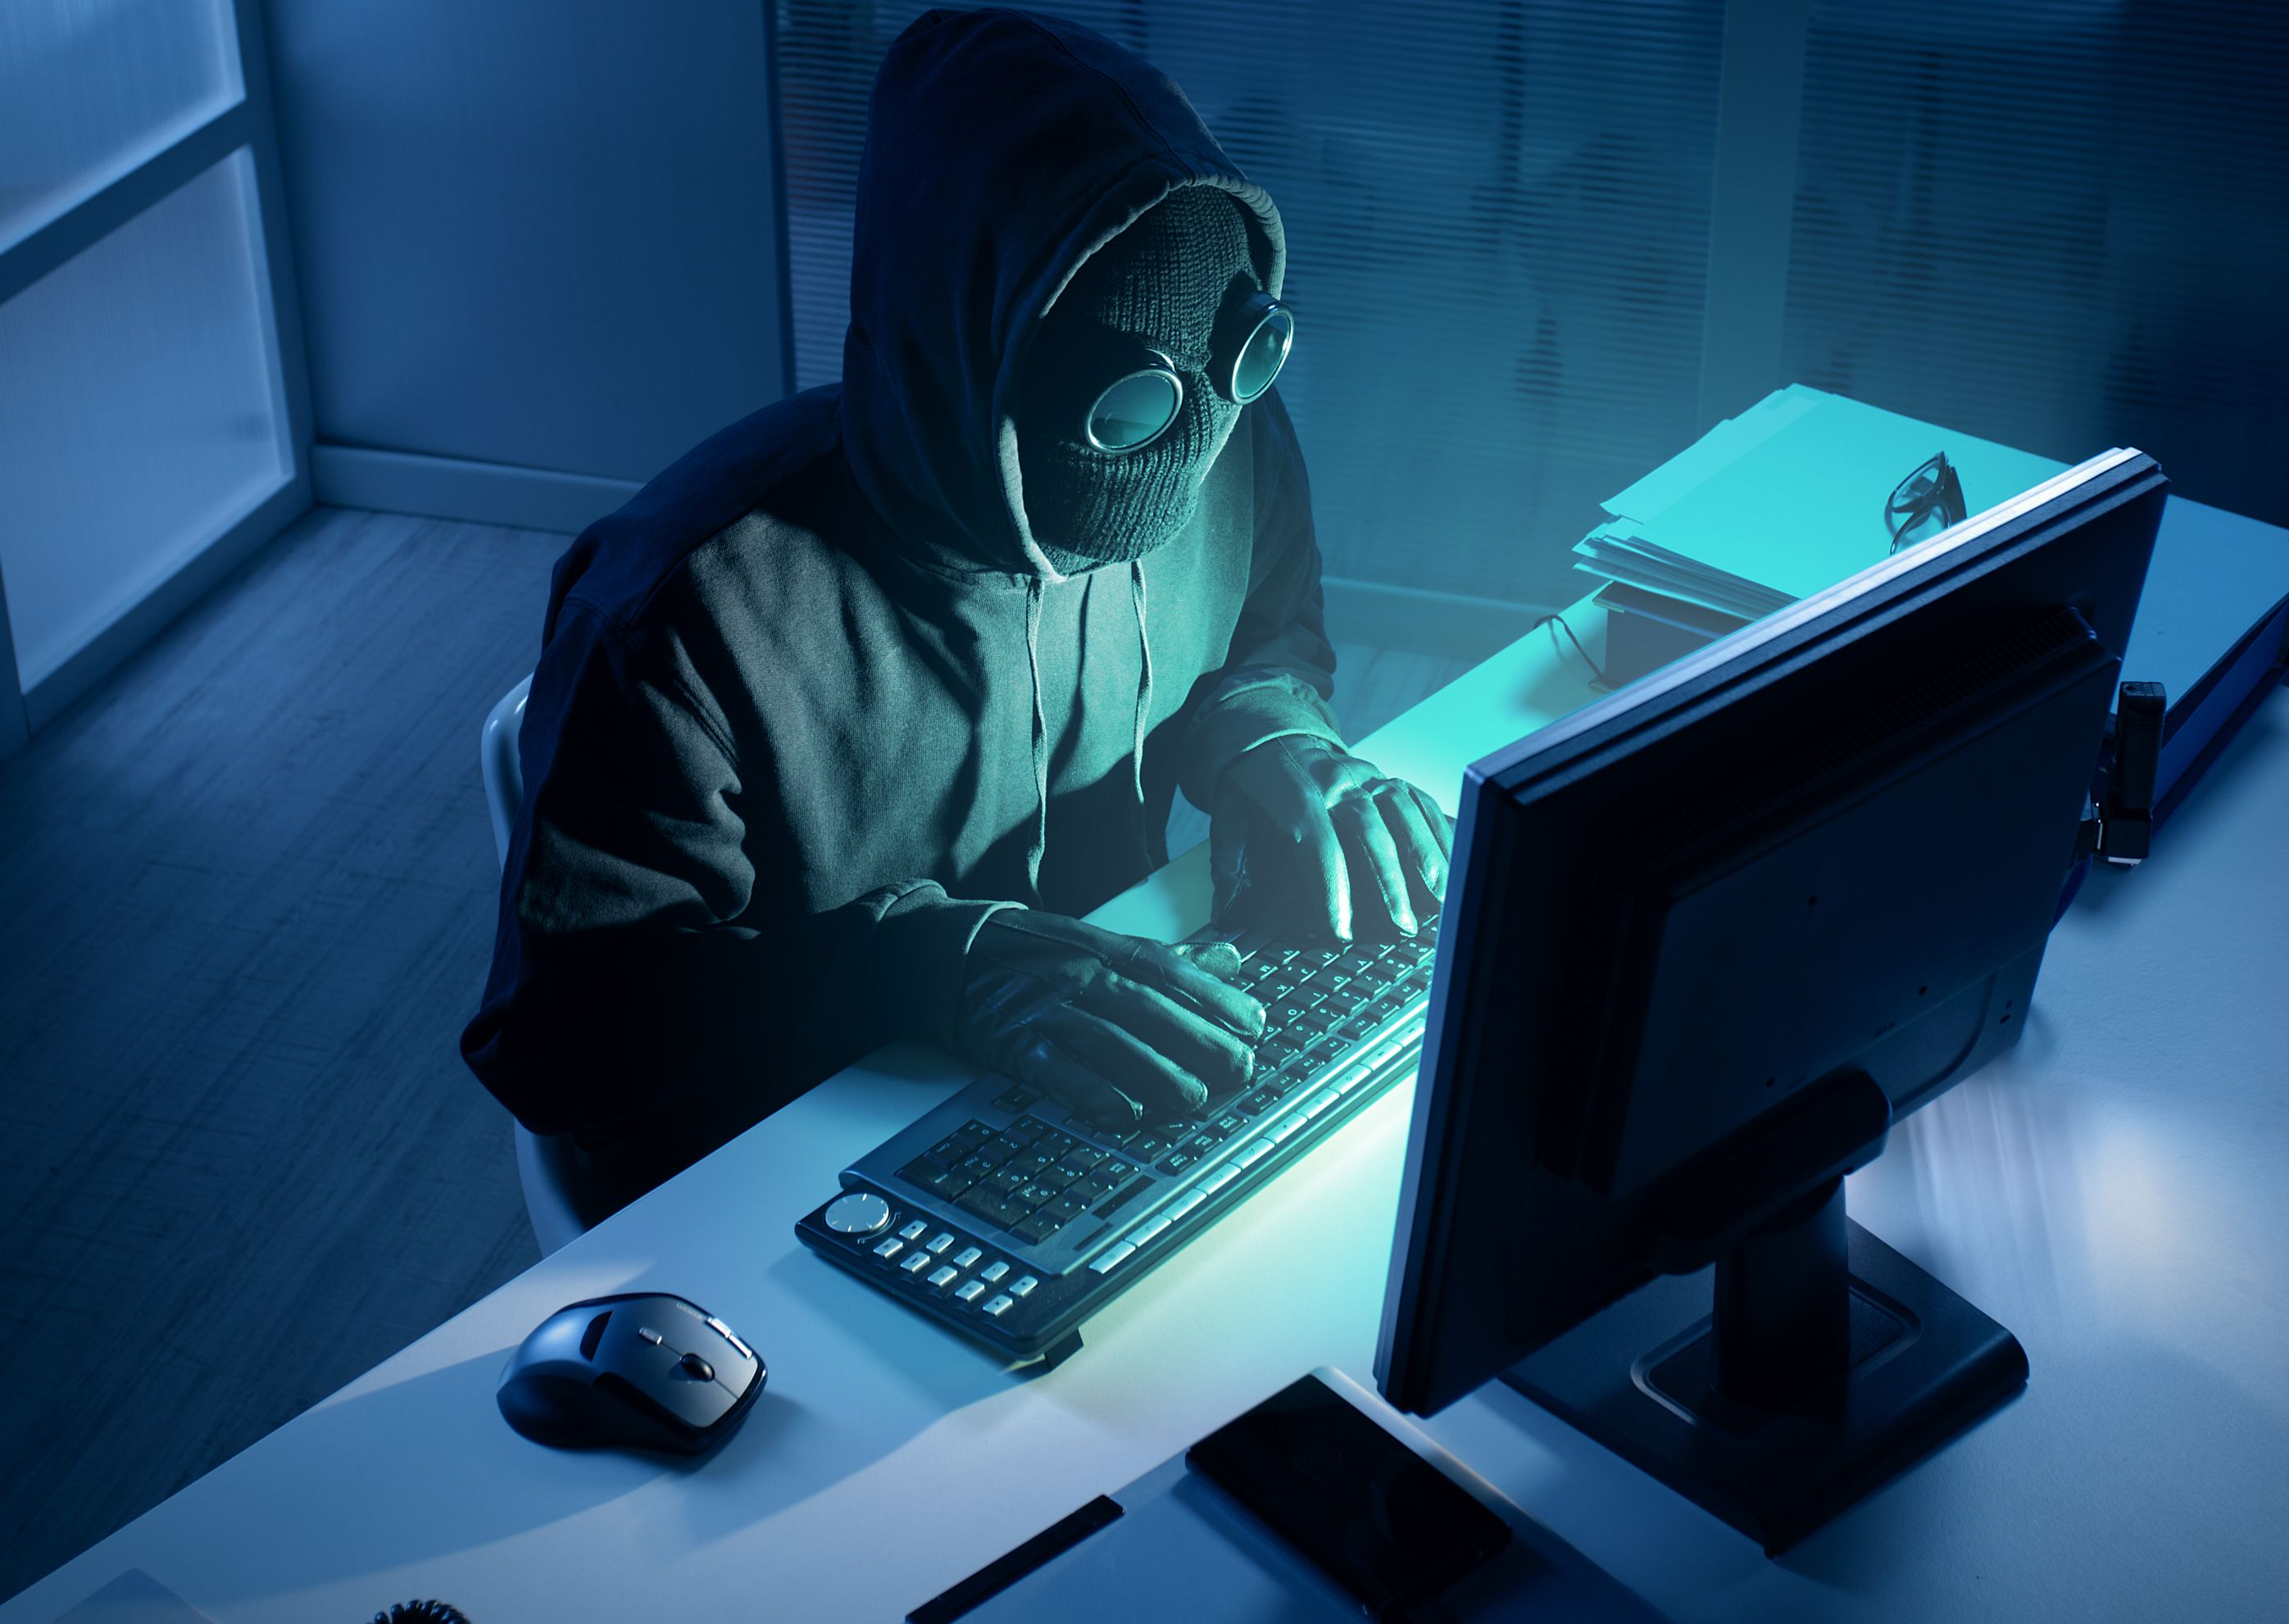 Wikileaks: Στη δημοσιότητα μήνυμα e-mail του διευθυντή του CIA | tovima.gr